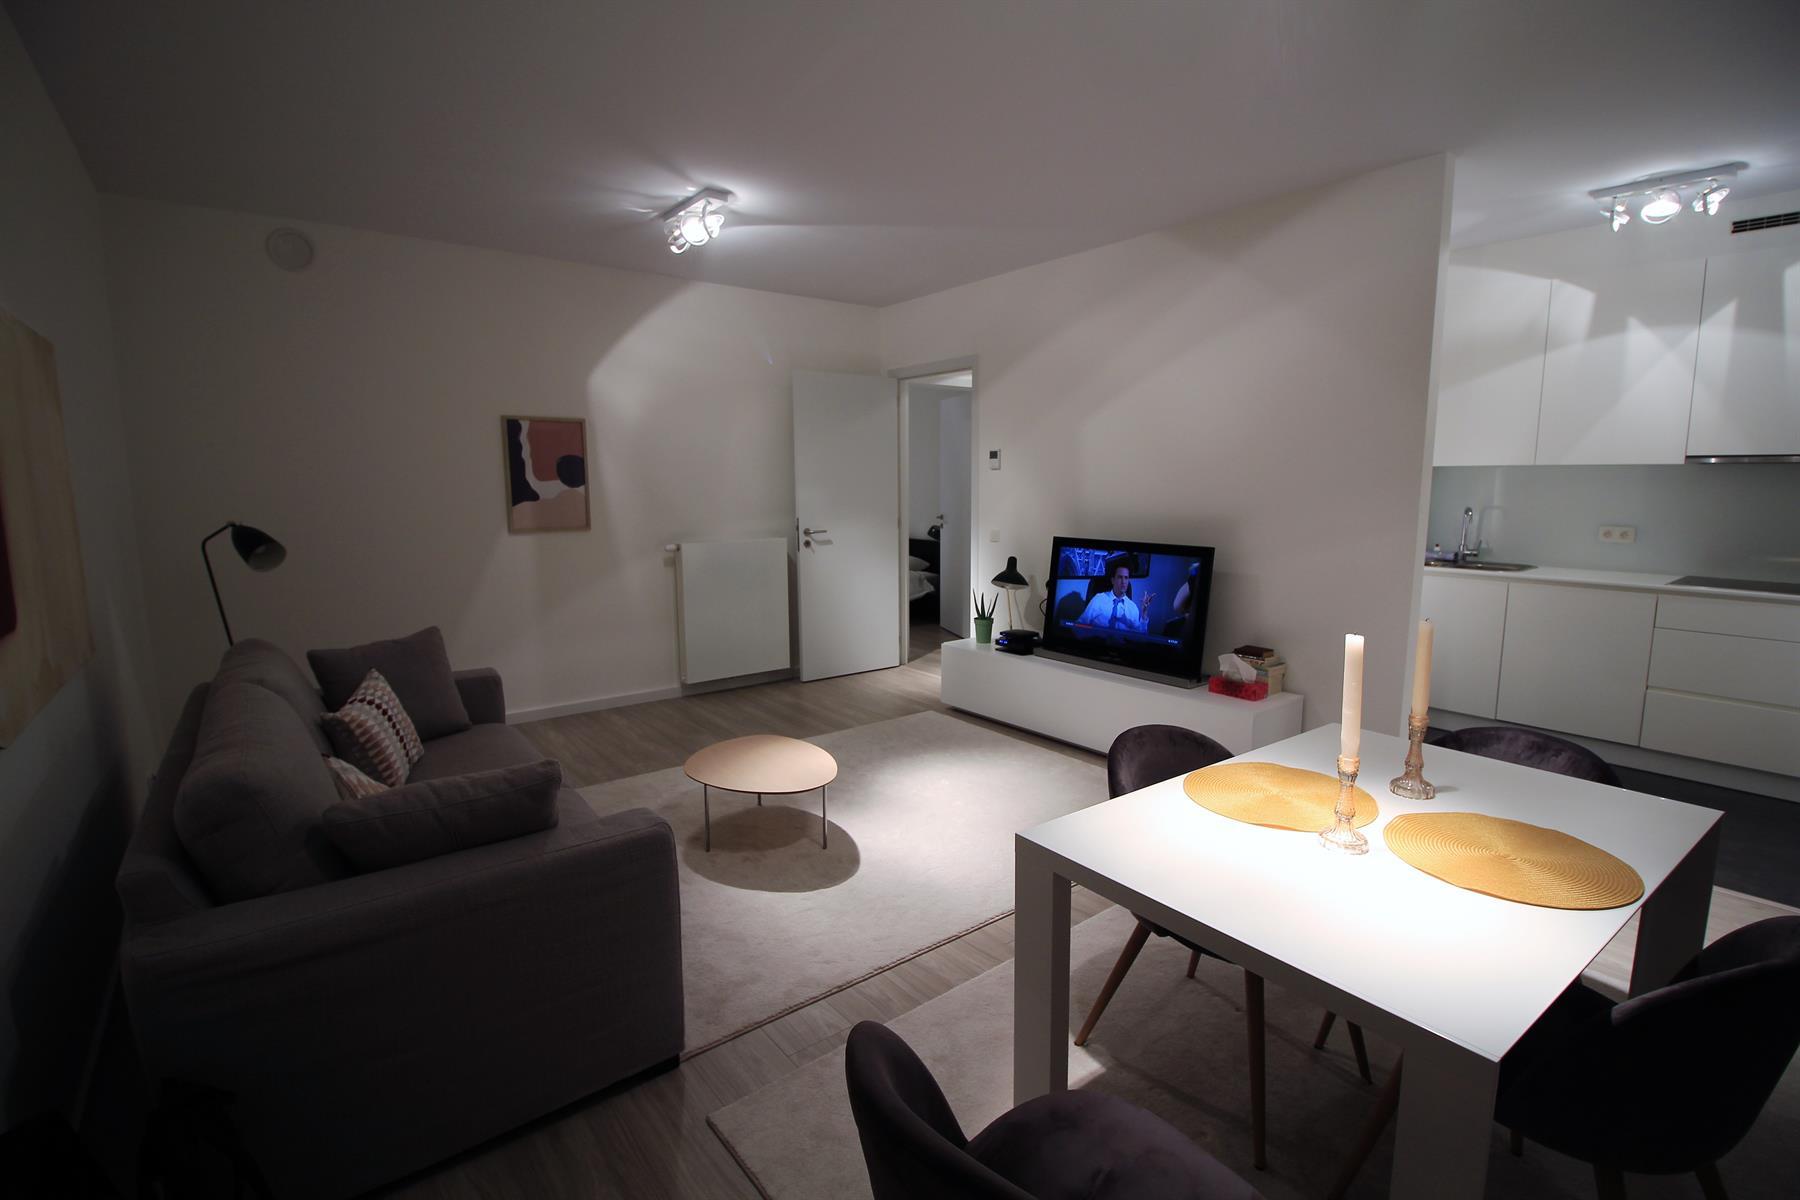 Appartement - Woluwe-Saint-Lambert - #4092326-1